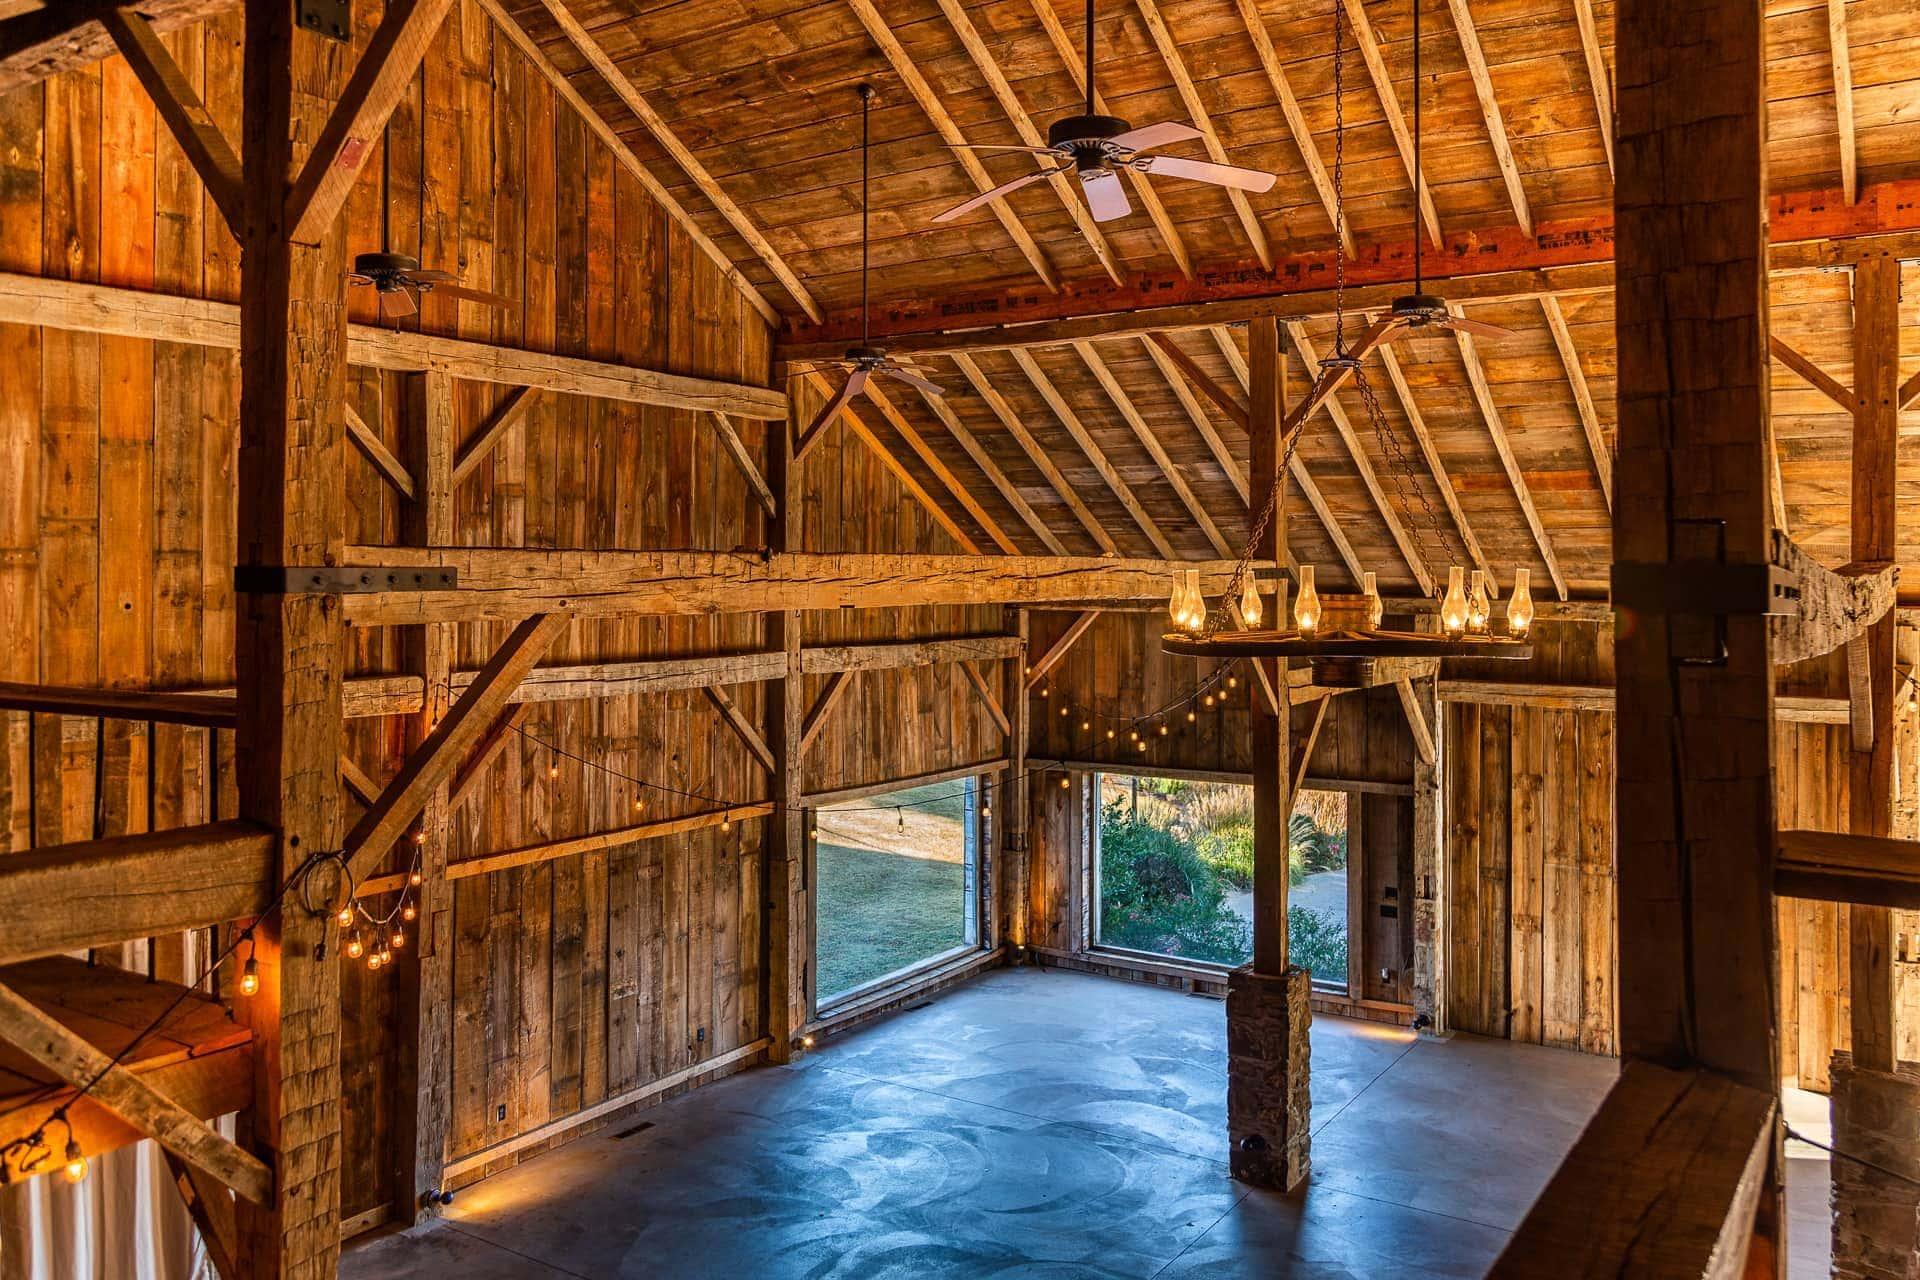 Interior of the Barn at Esperanza Ranch